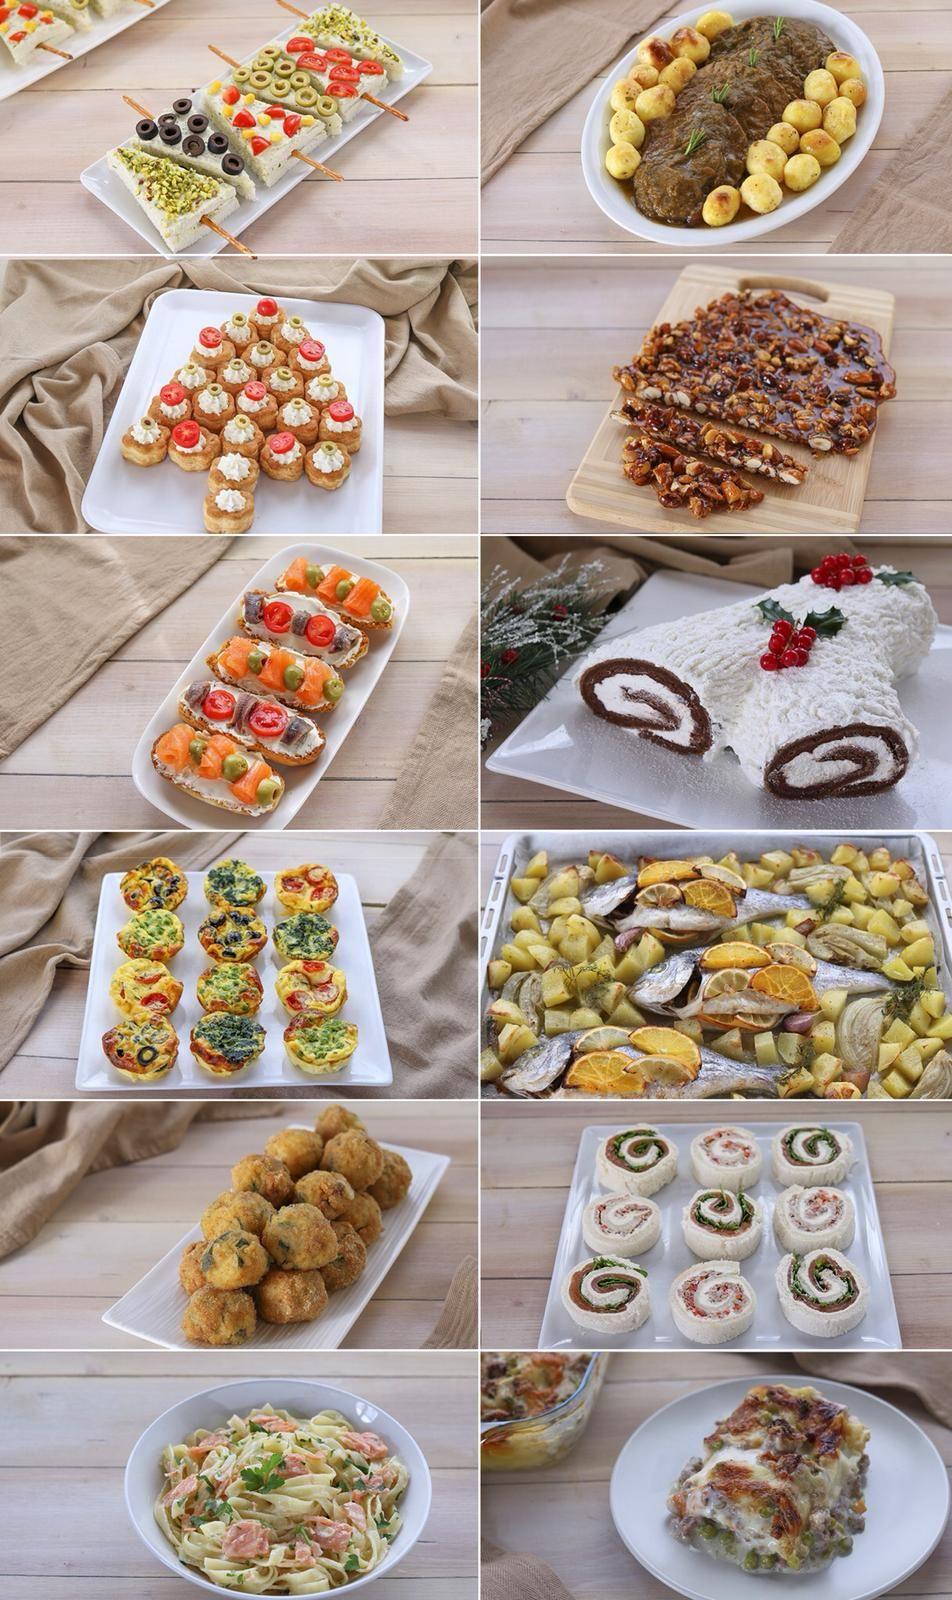 Antipasti Di Natale Cucina Italiana.Menu Di Natale Ricetta Ricette Di Cucina Ricette E Mangia E Bevi